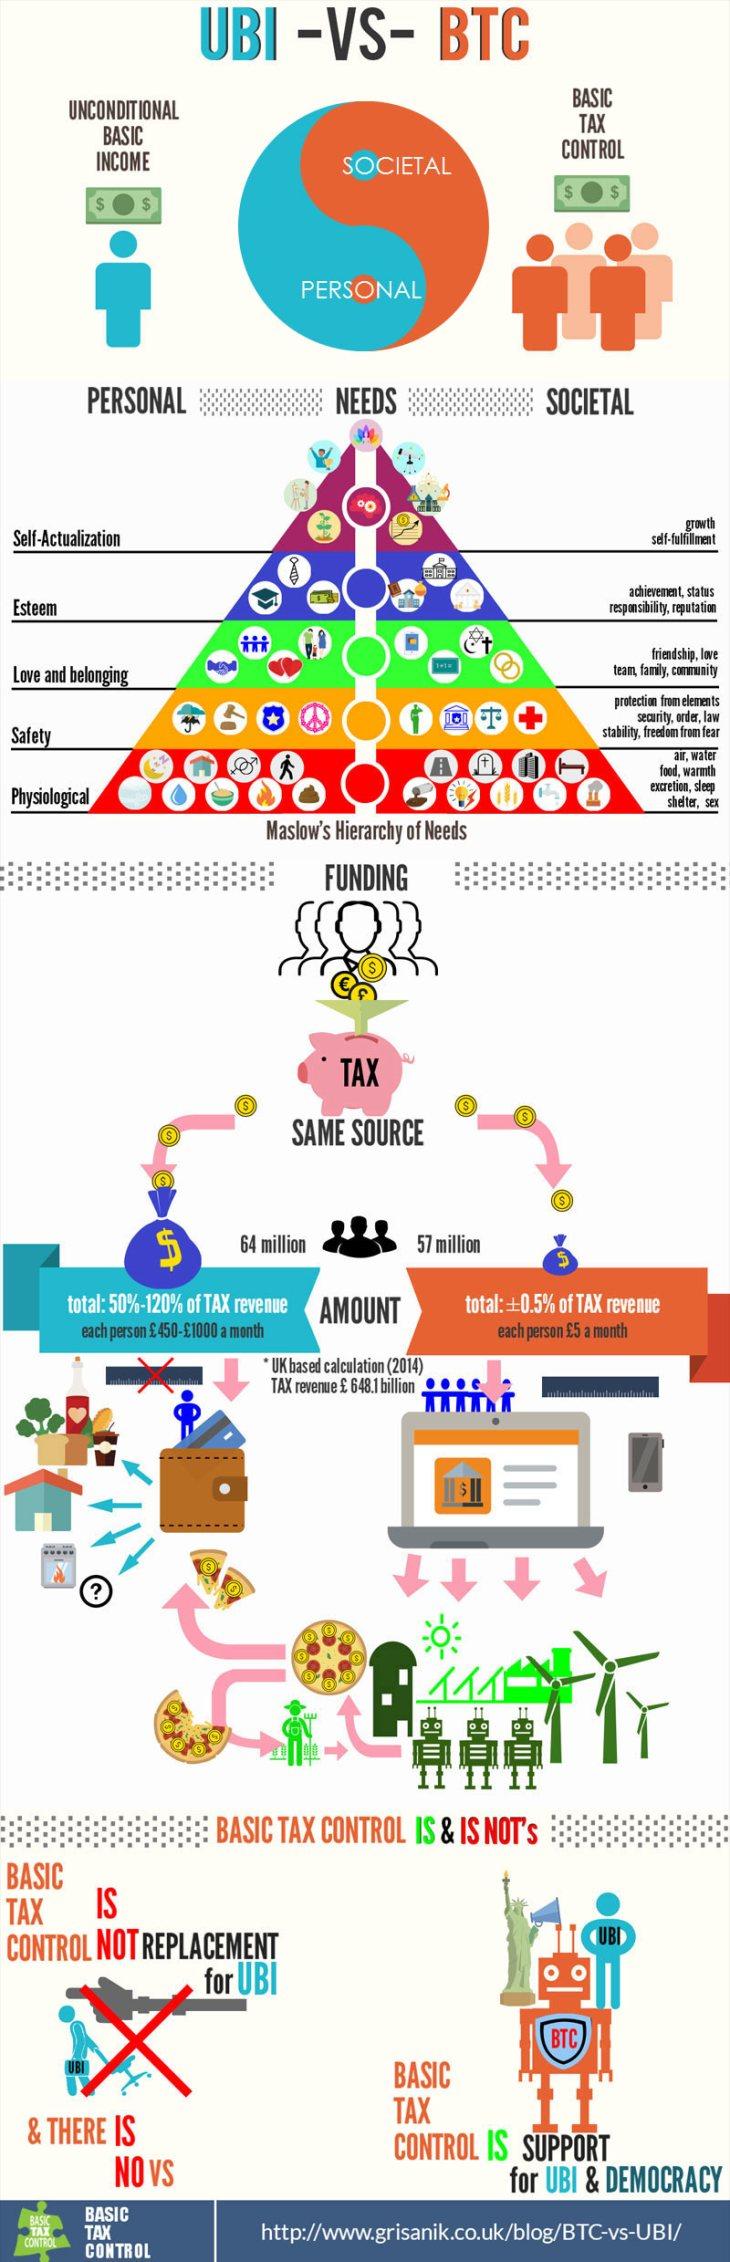 btc vs ubi infographic universal basic income infographic